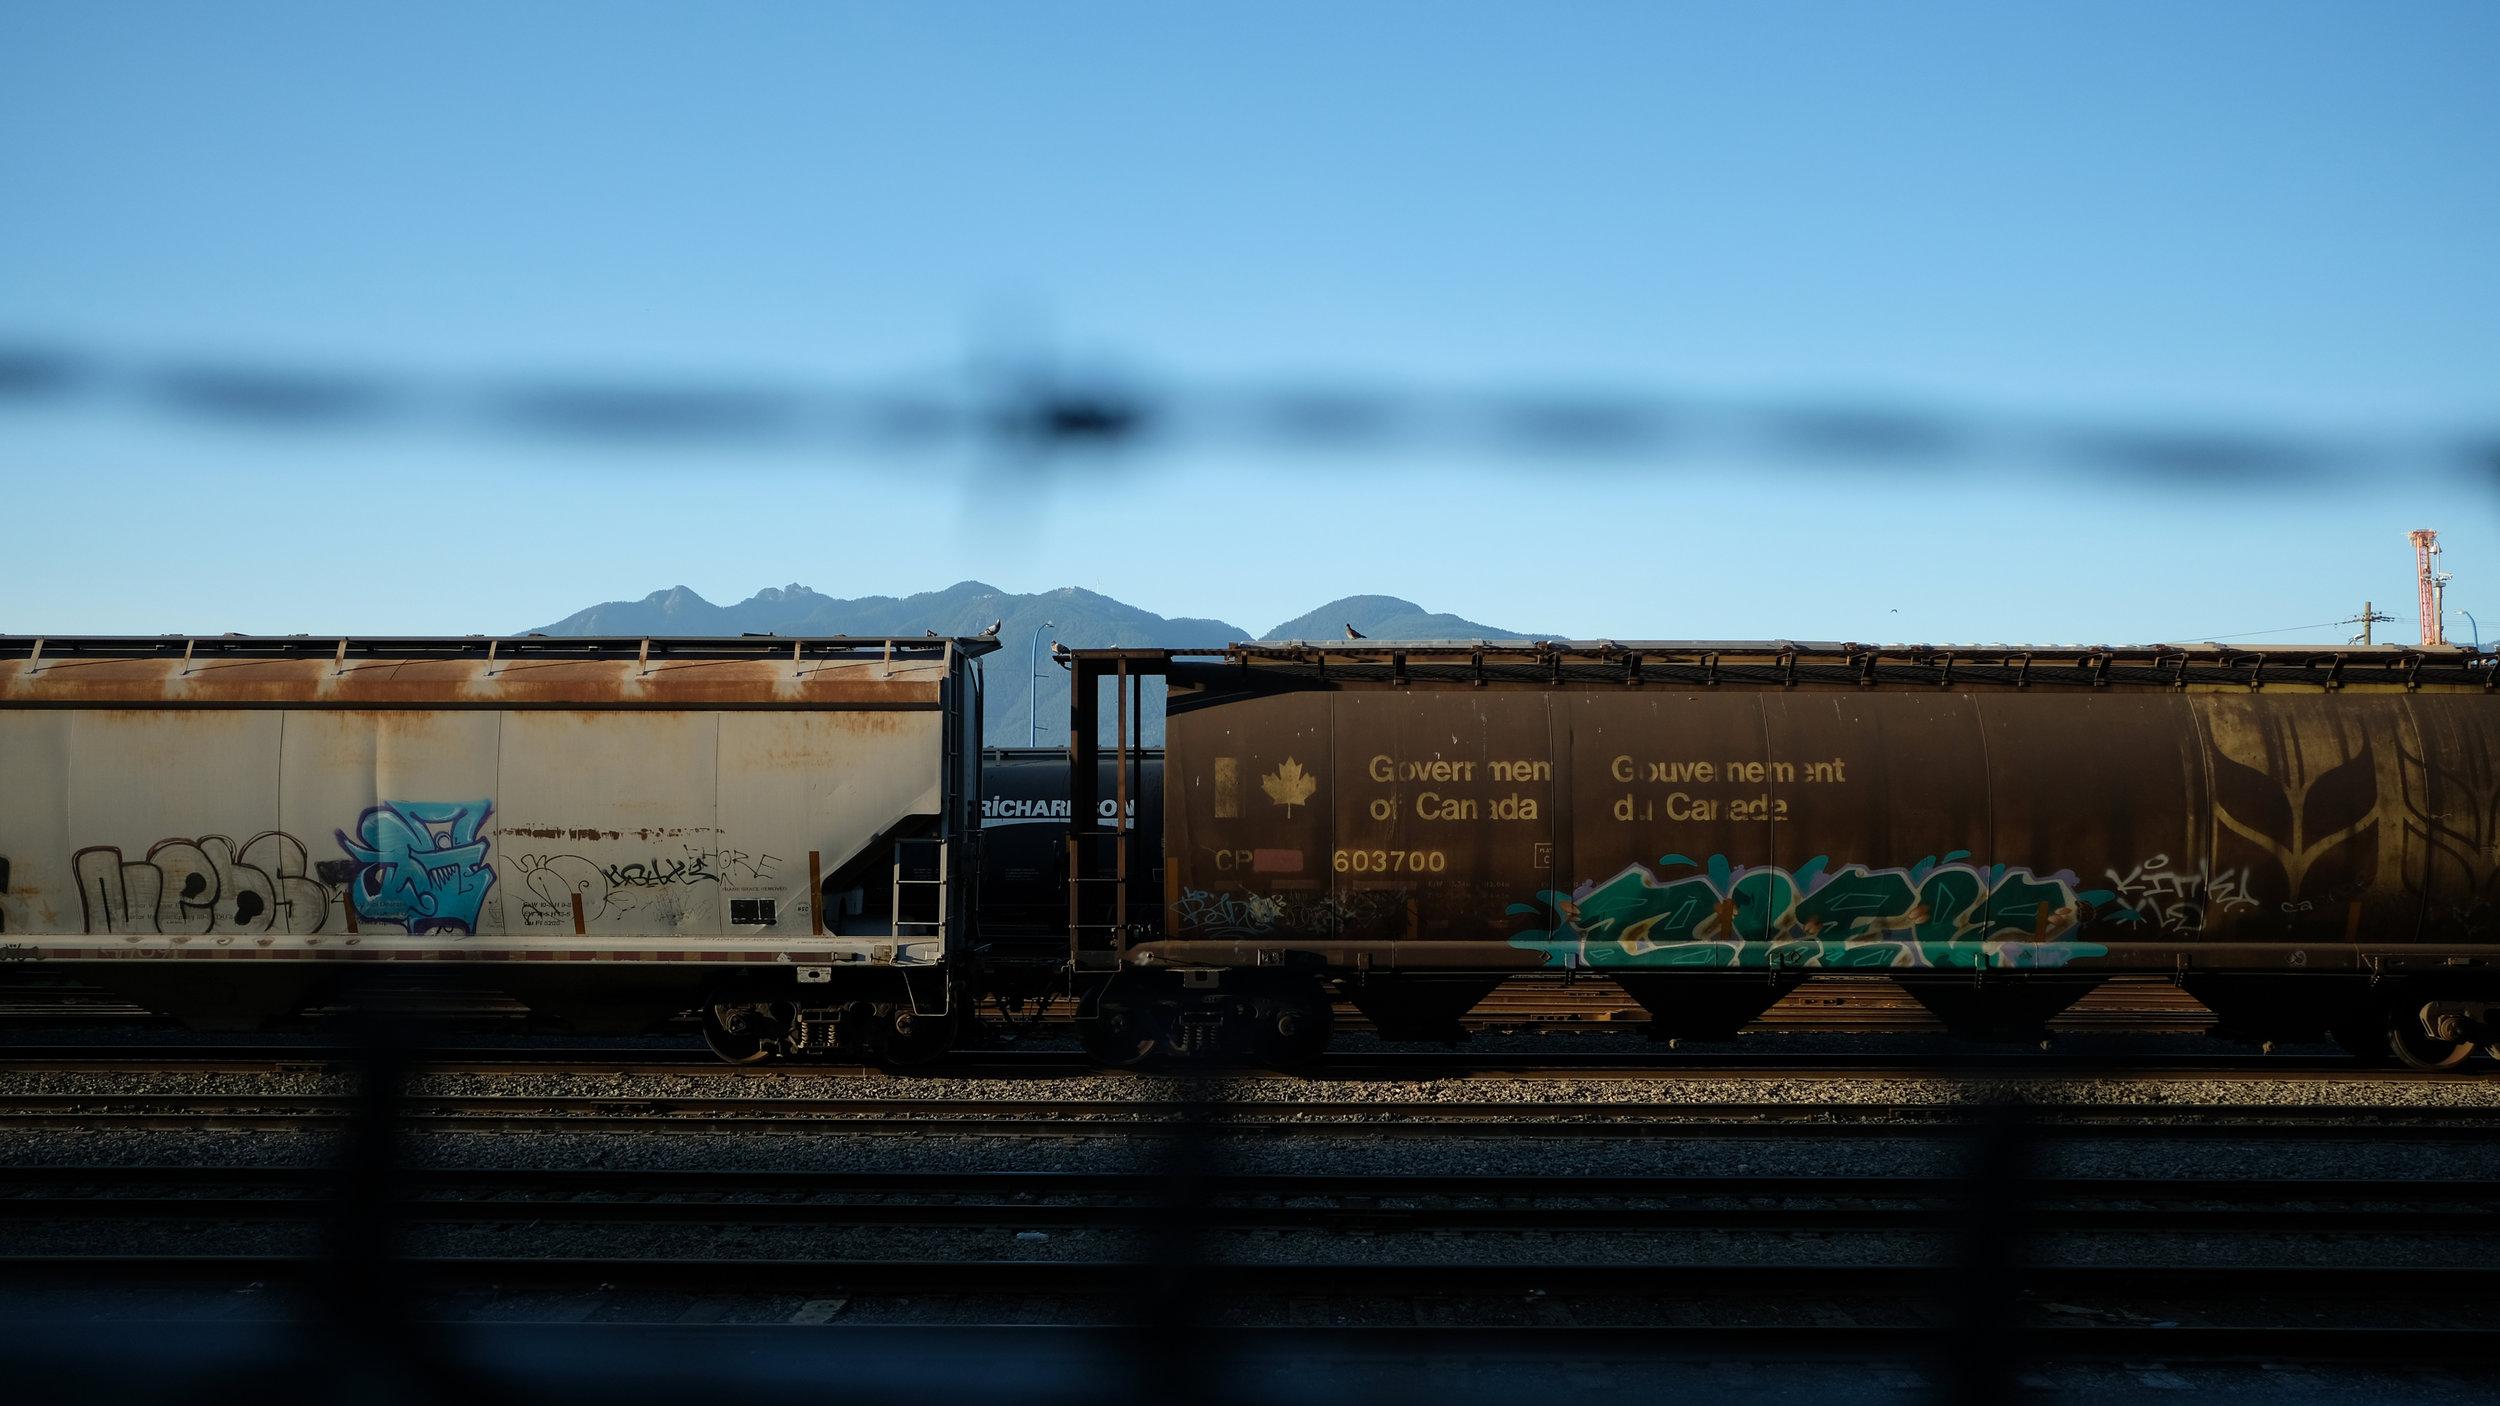 01_VANCOUVER_Trains.jpg